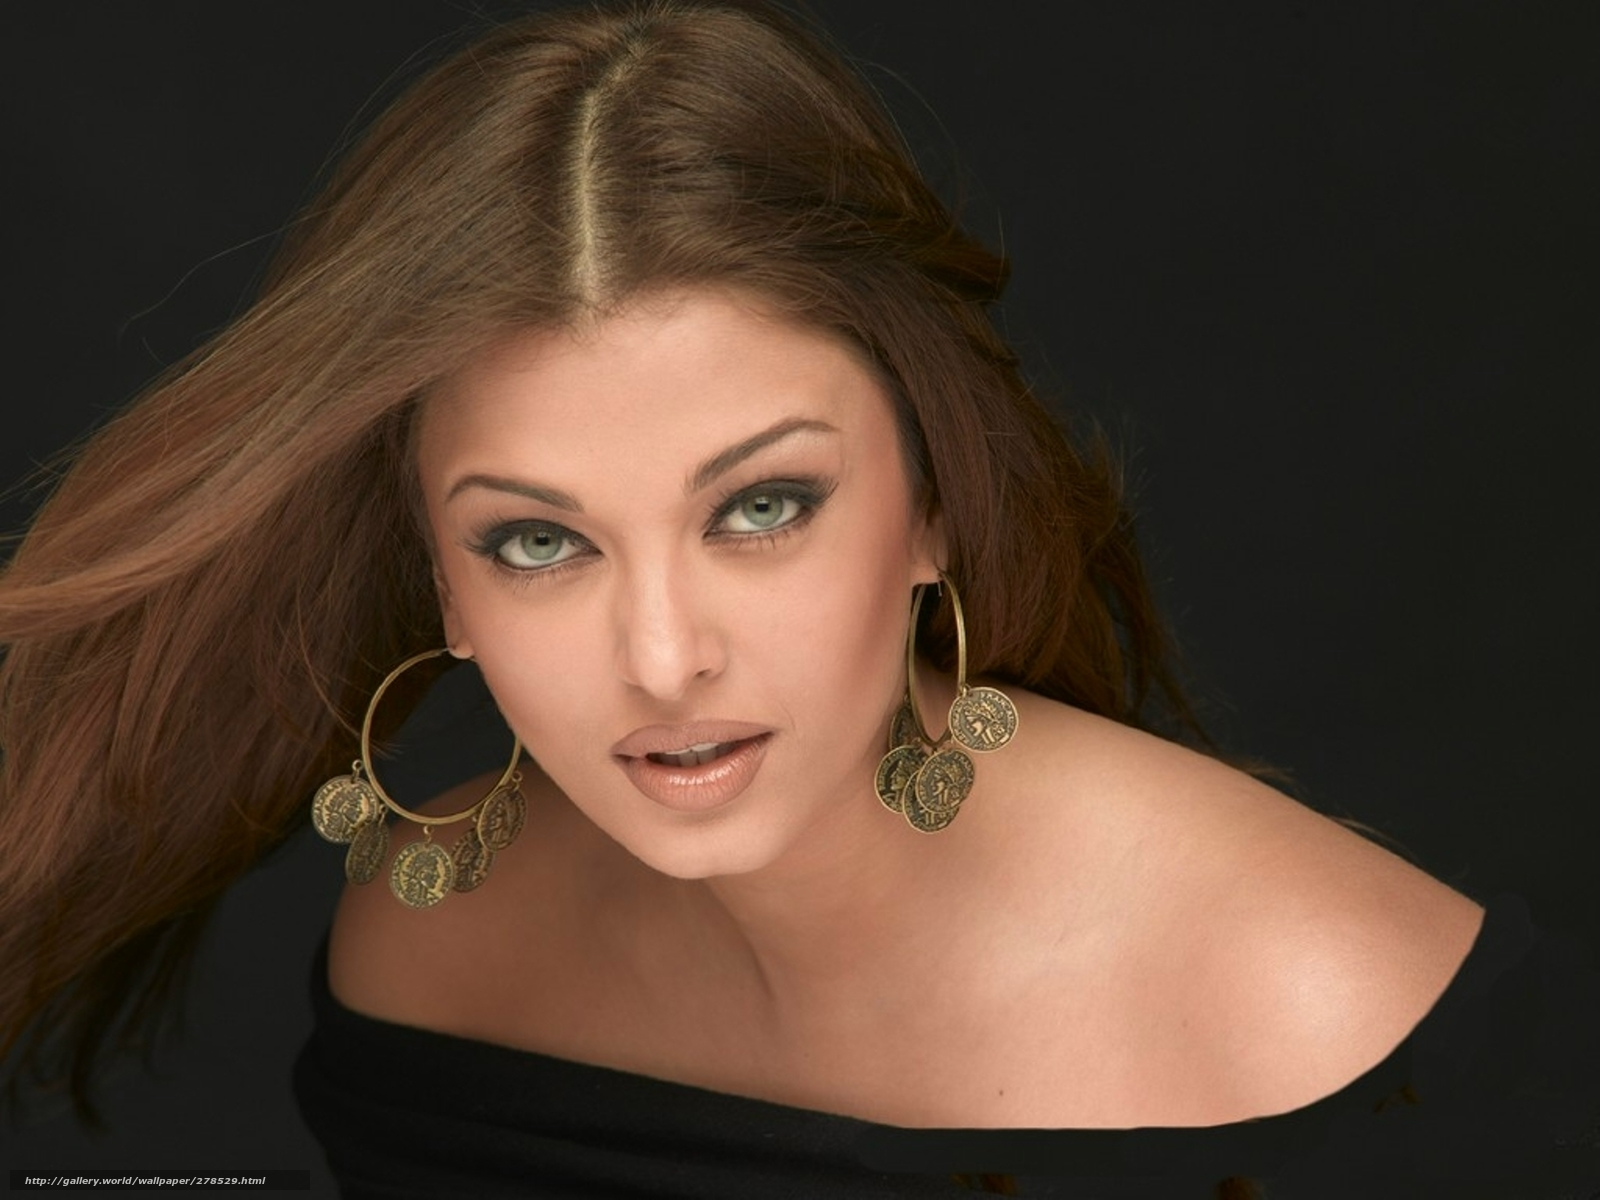 Aishwarya rai, актриса, индианка, девушка, звезда.